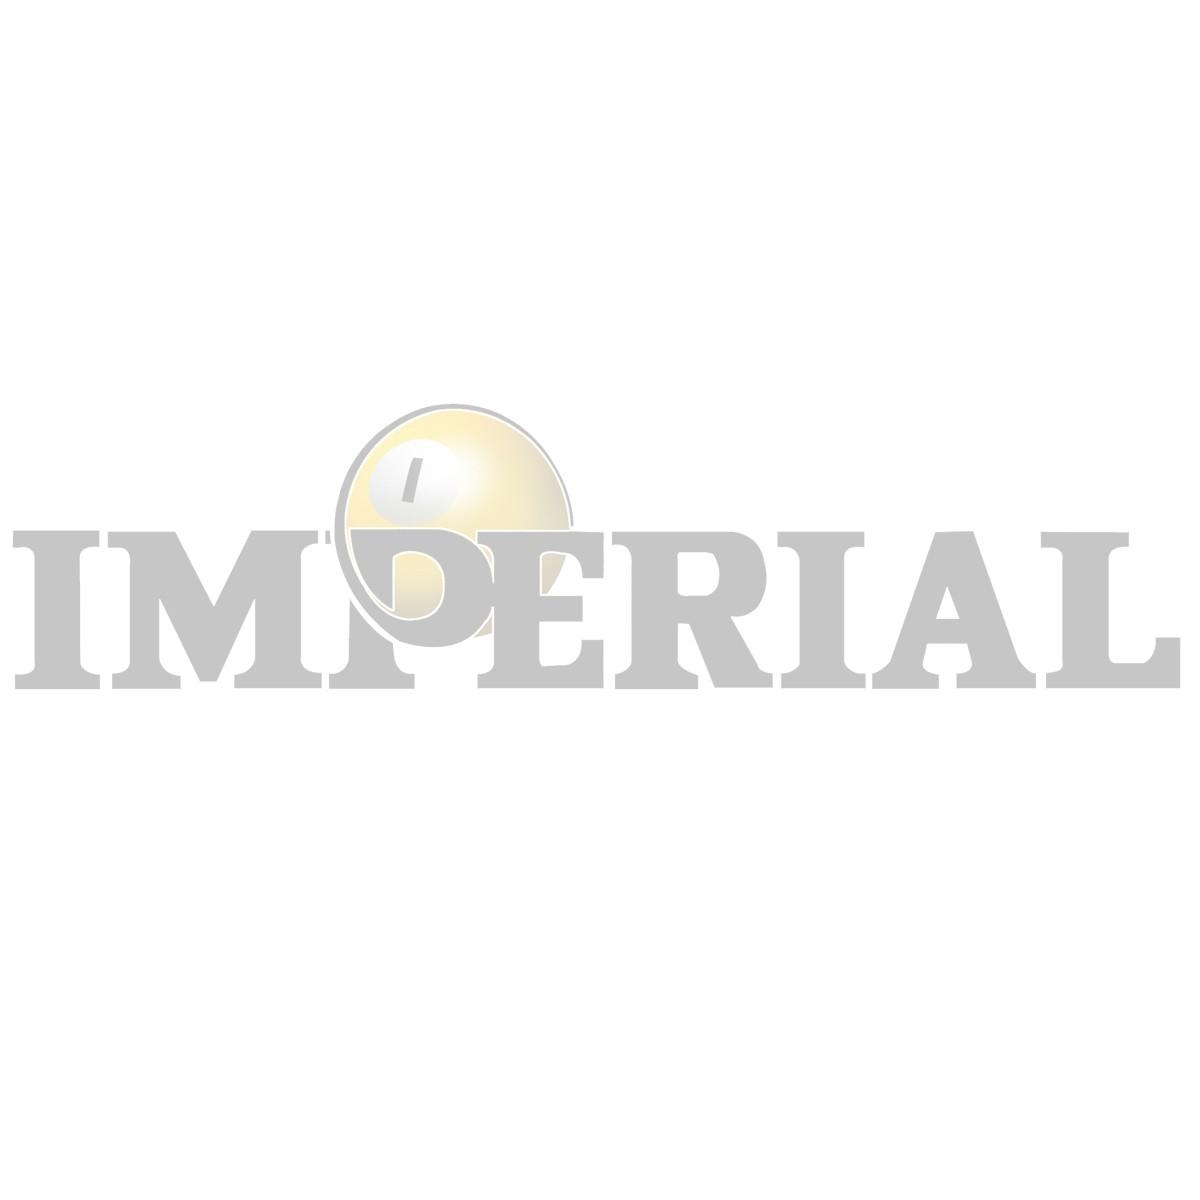 Toronto Blue Jays 9-foot Billiard Cloth